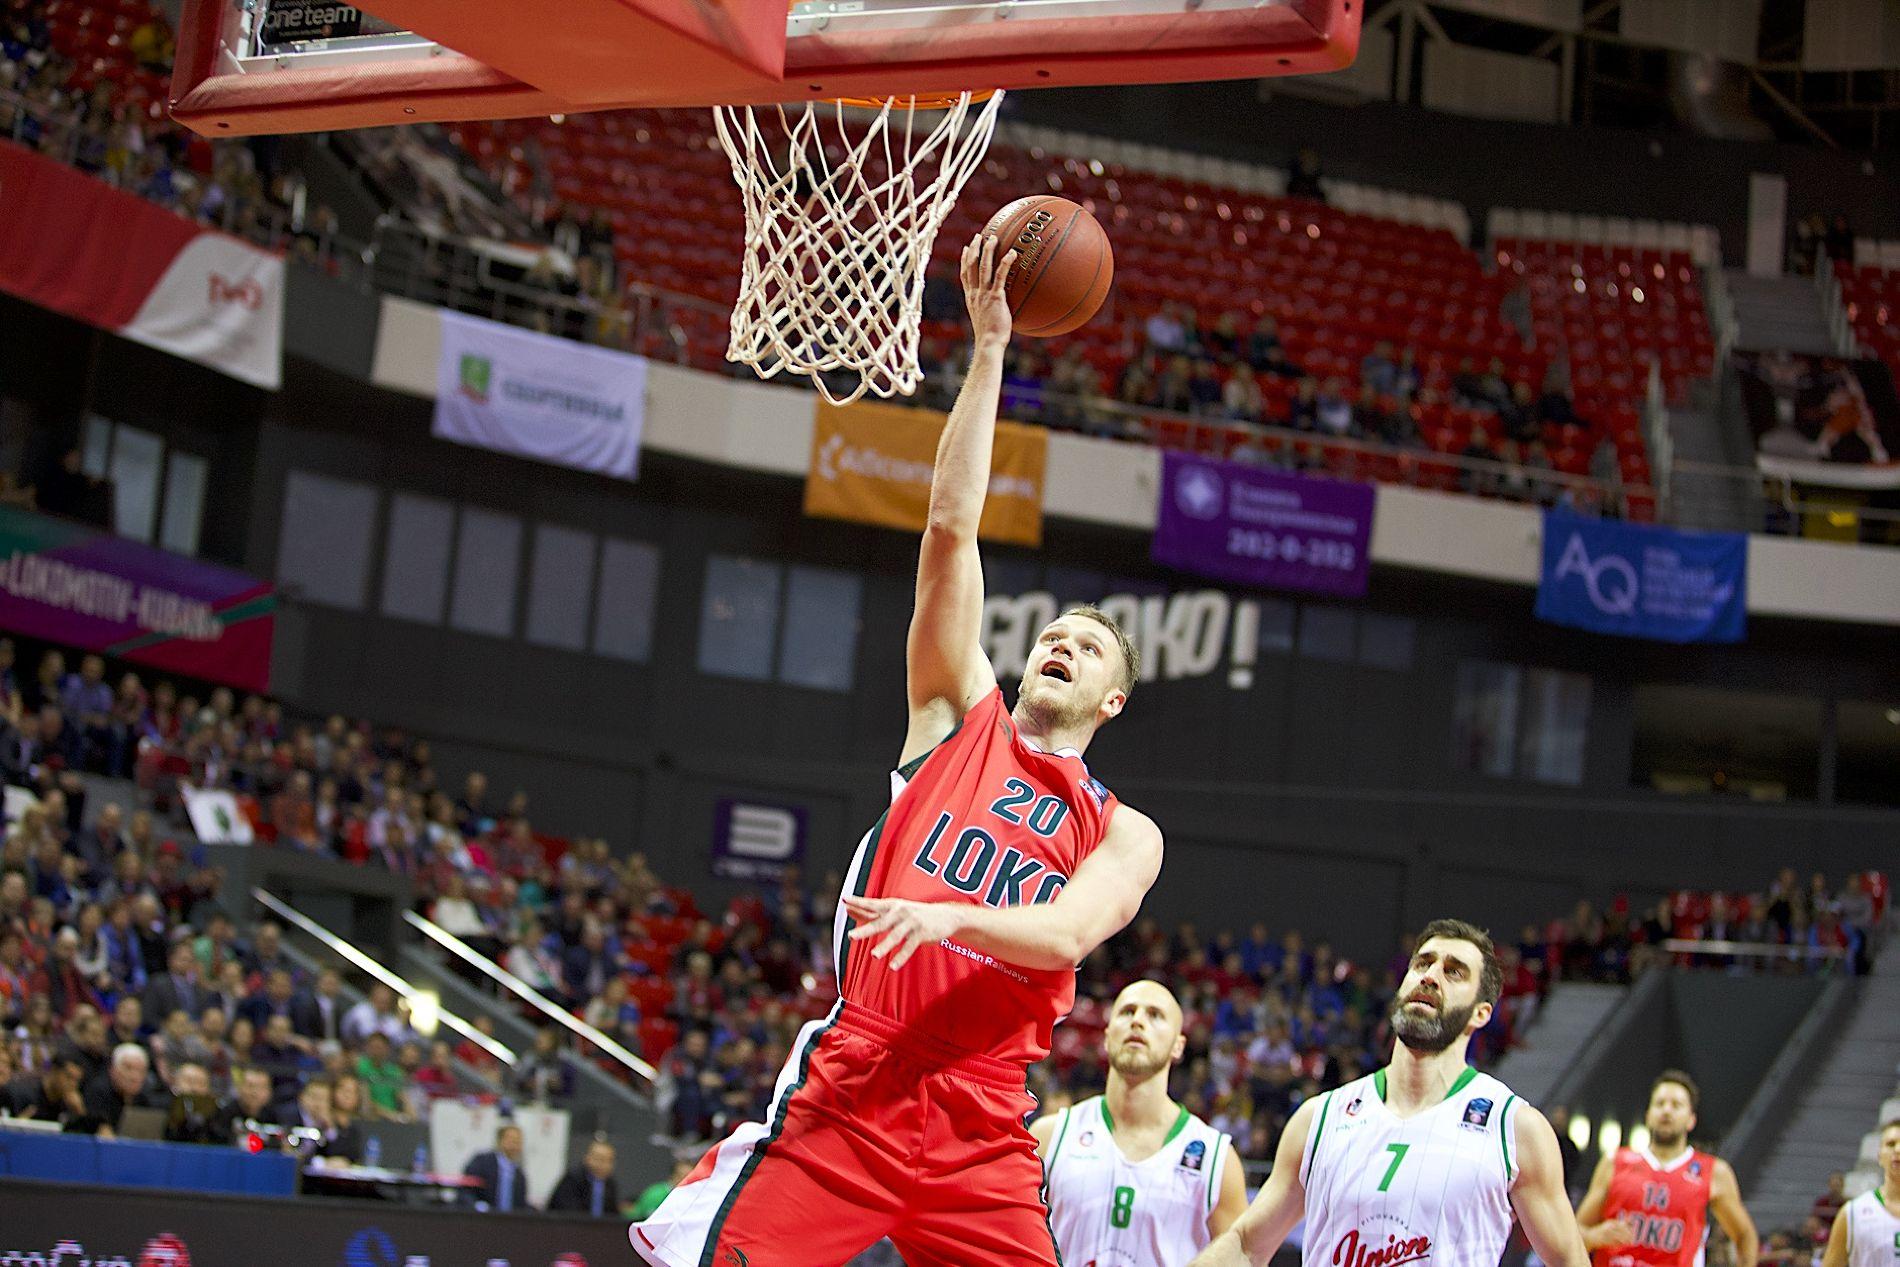 Баскетболисты «Локомотива-Кубани» дома победили словенскую «Олимпию» вматчеКЕ